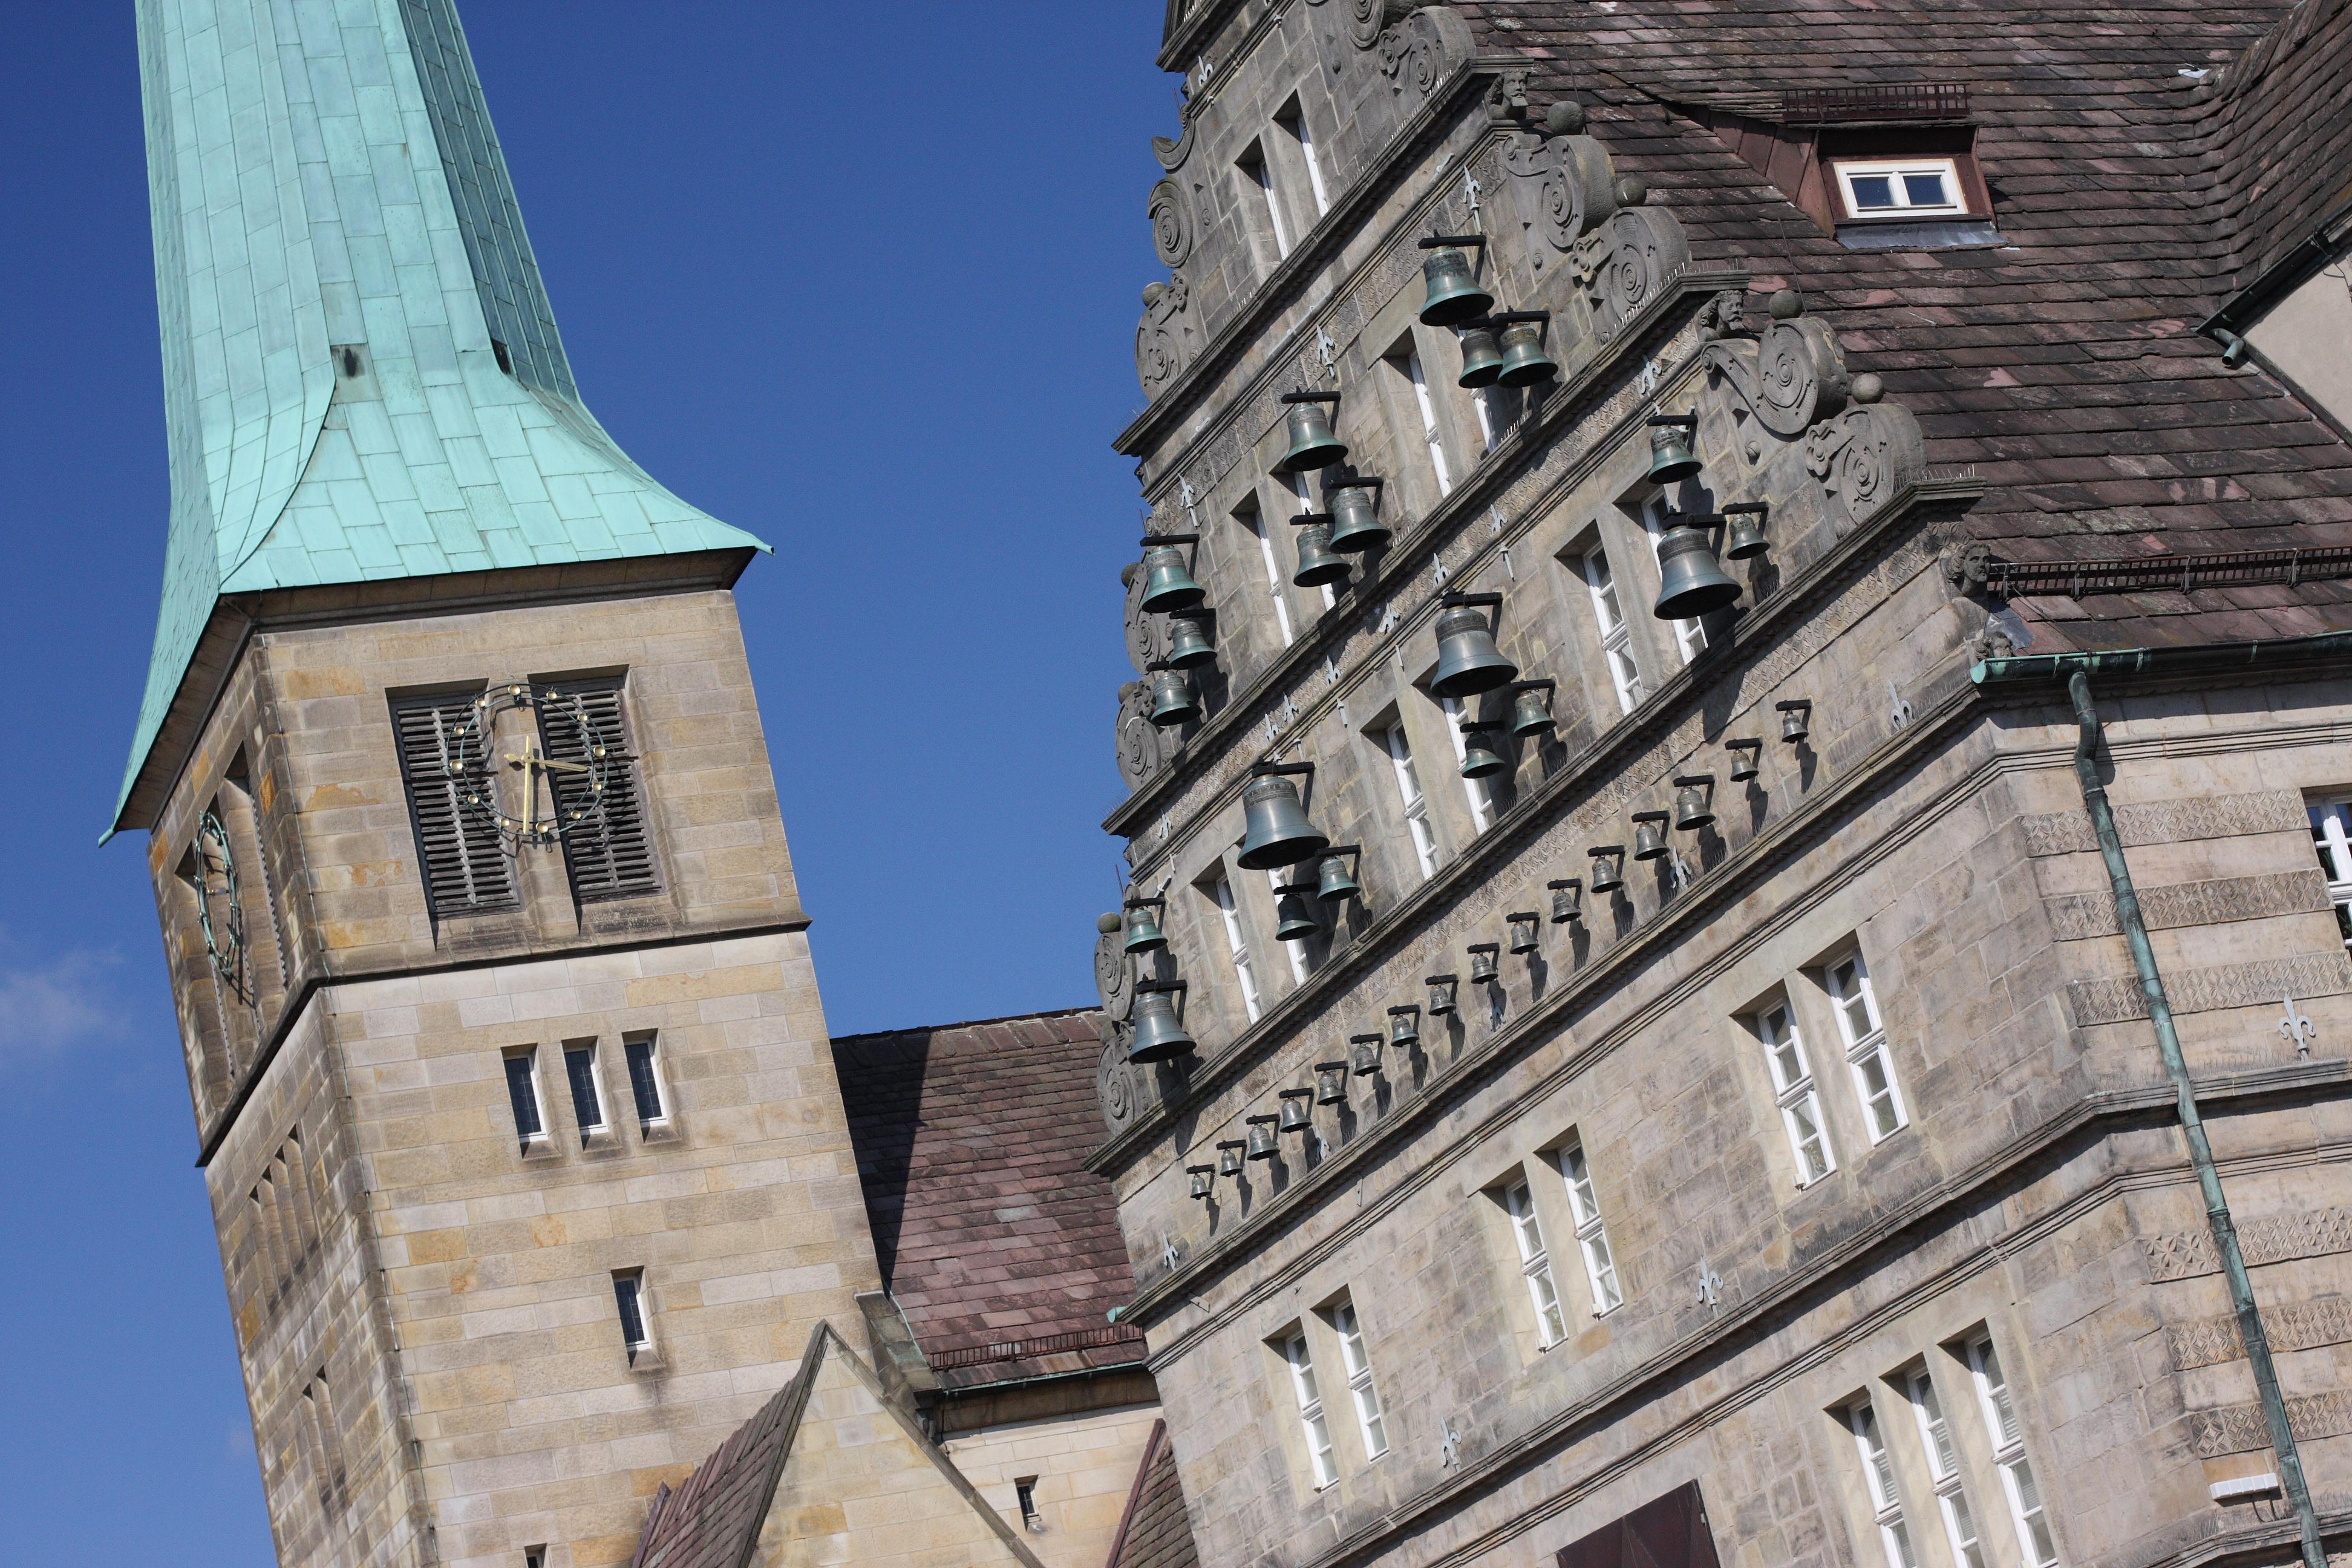 Hameln Germany  city photos gallery : Description Hameln, Germany 5565095231